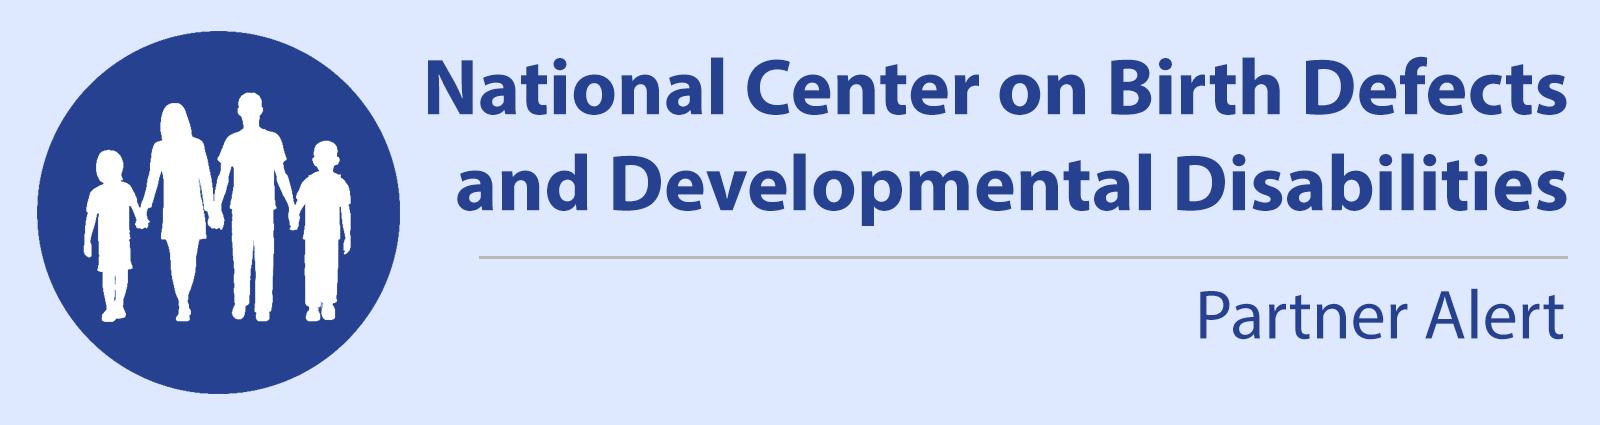 National Center on Birth Defects and Developmental Disabilities Partner Alert